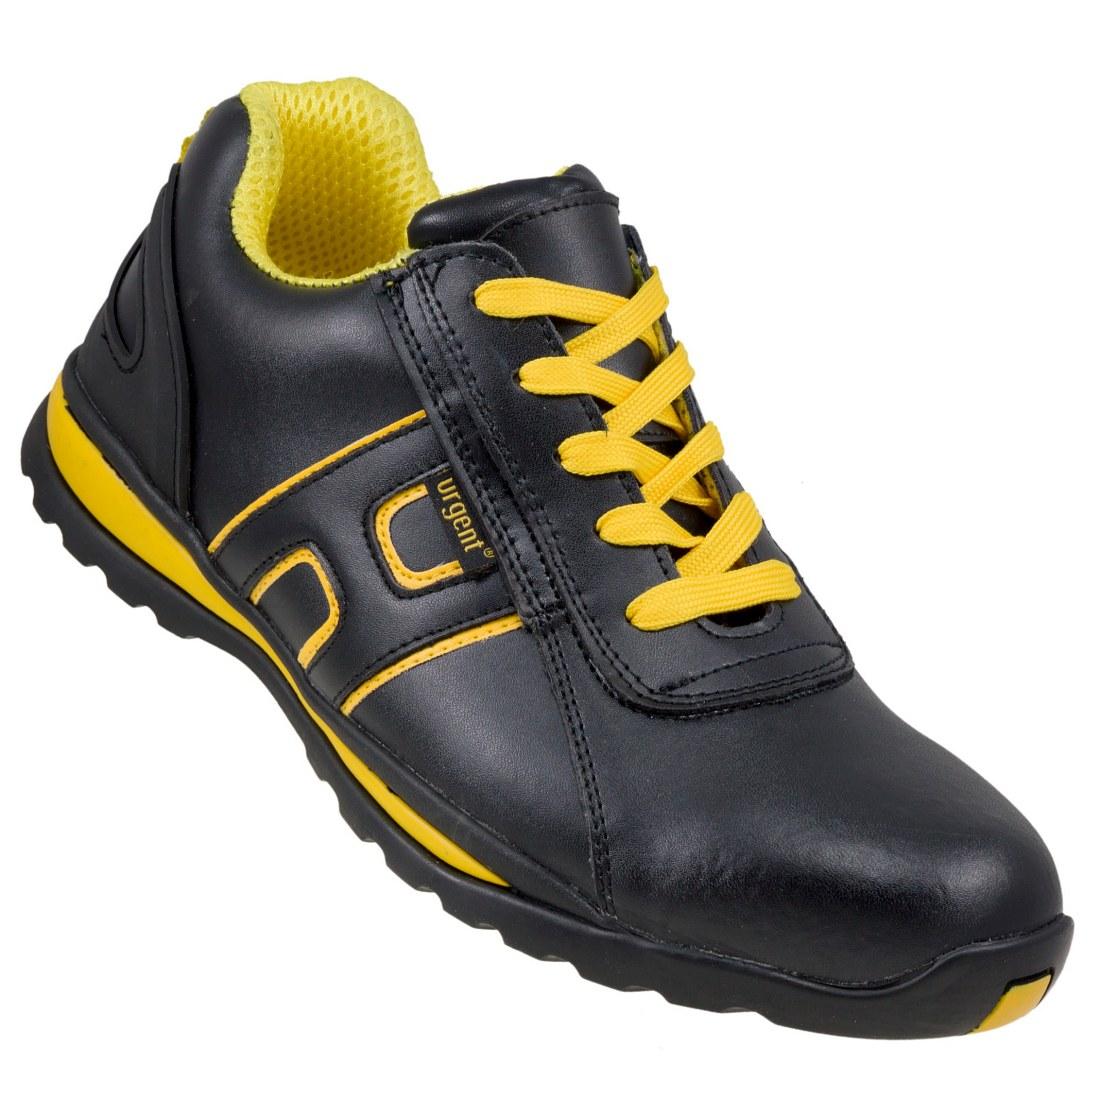 c54fc98838a3 Optim marhabőr cipő 227 S1 empty